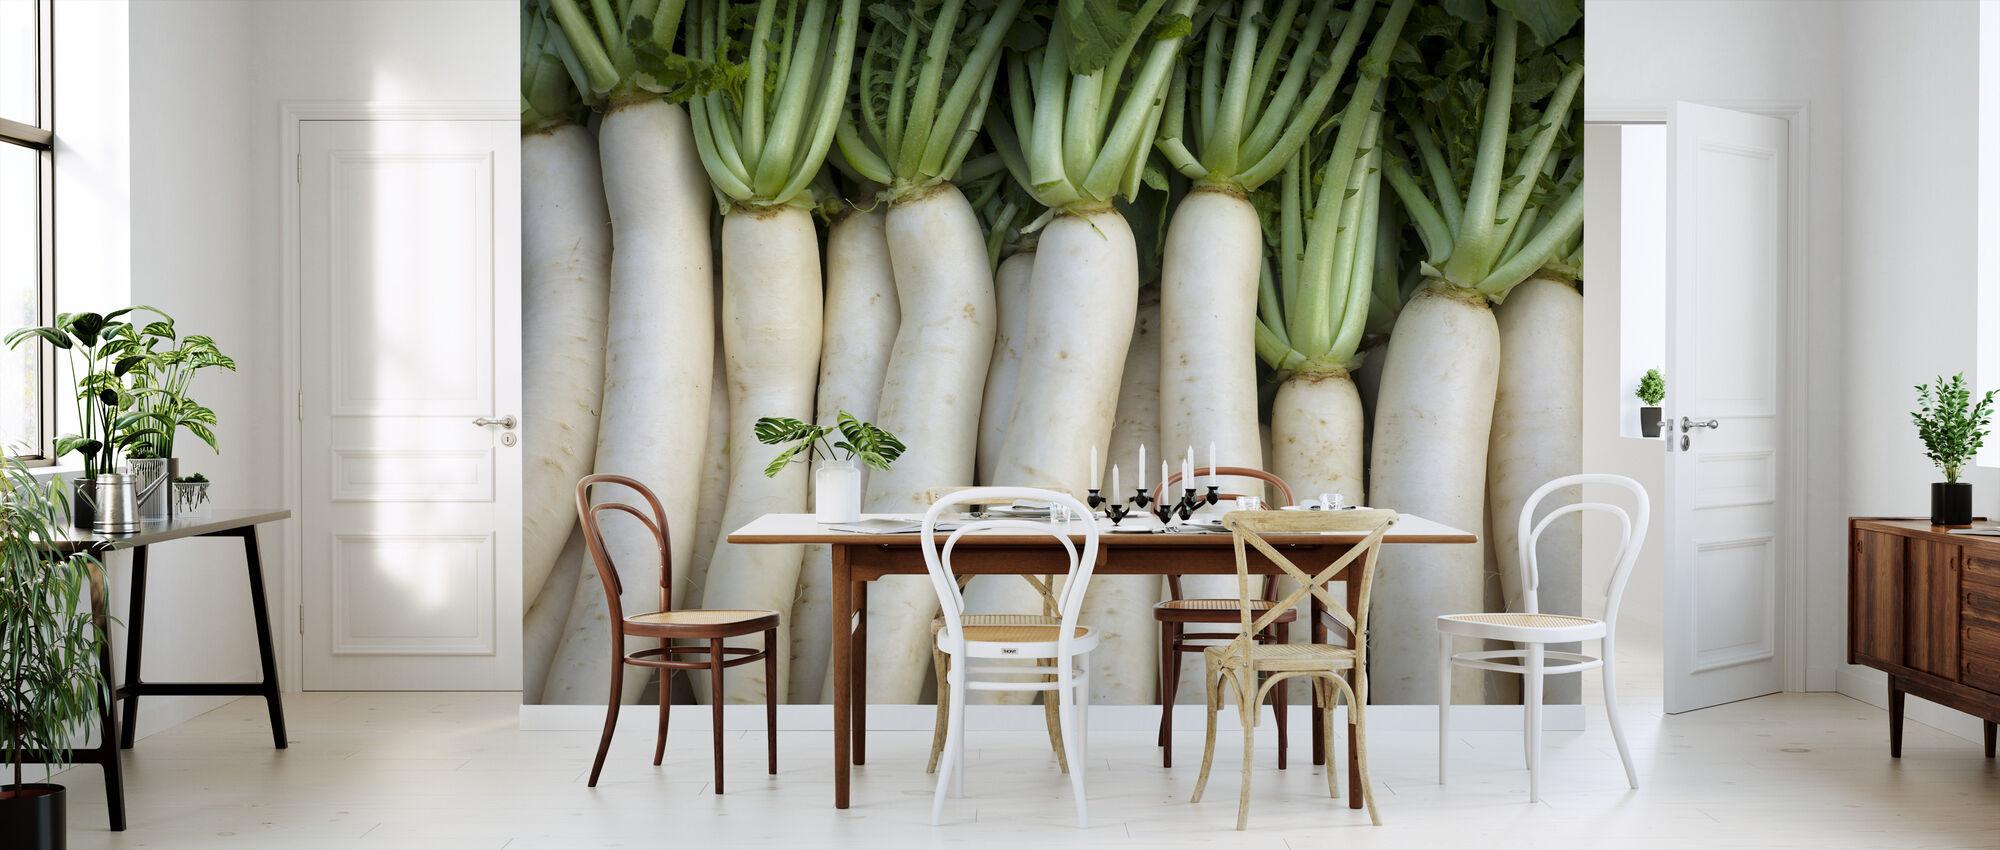 Turnips - Lluís Real - Wallpaper - Kitchen